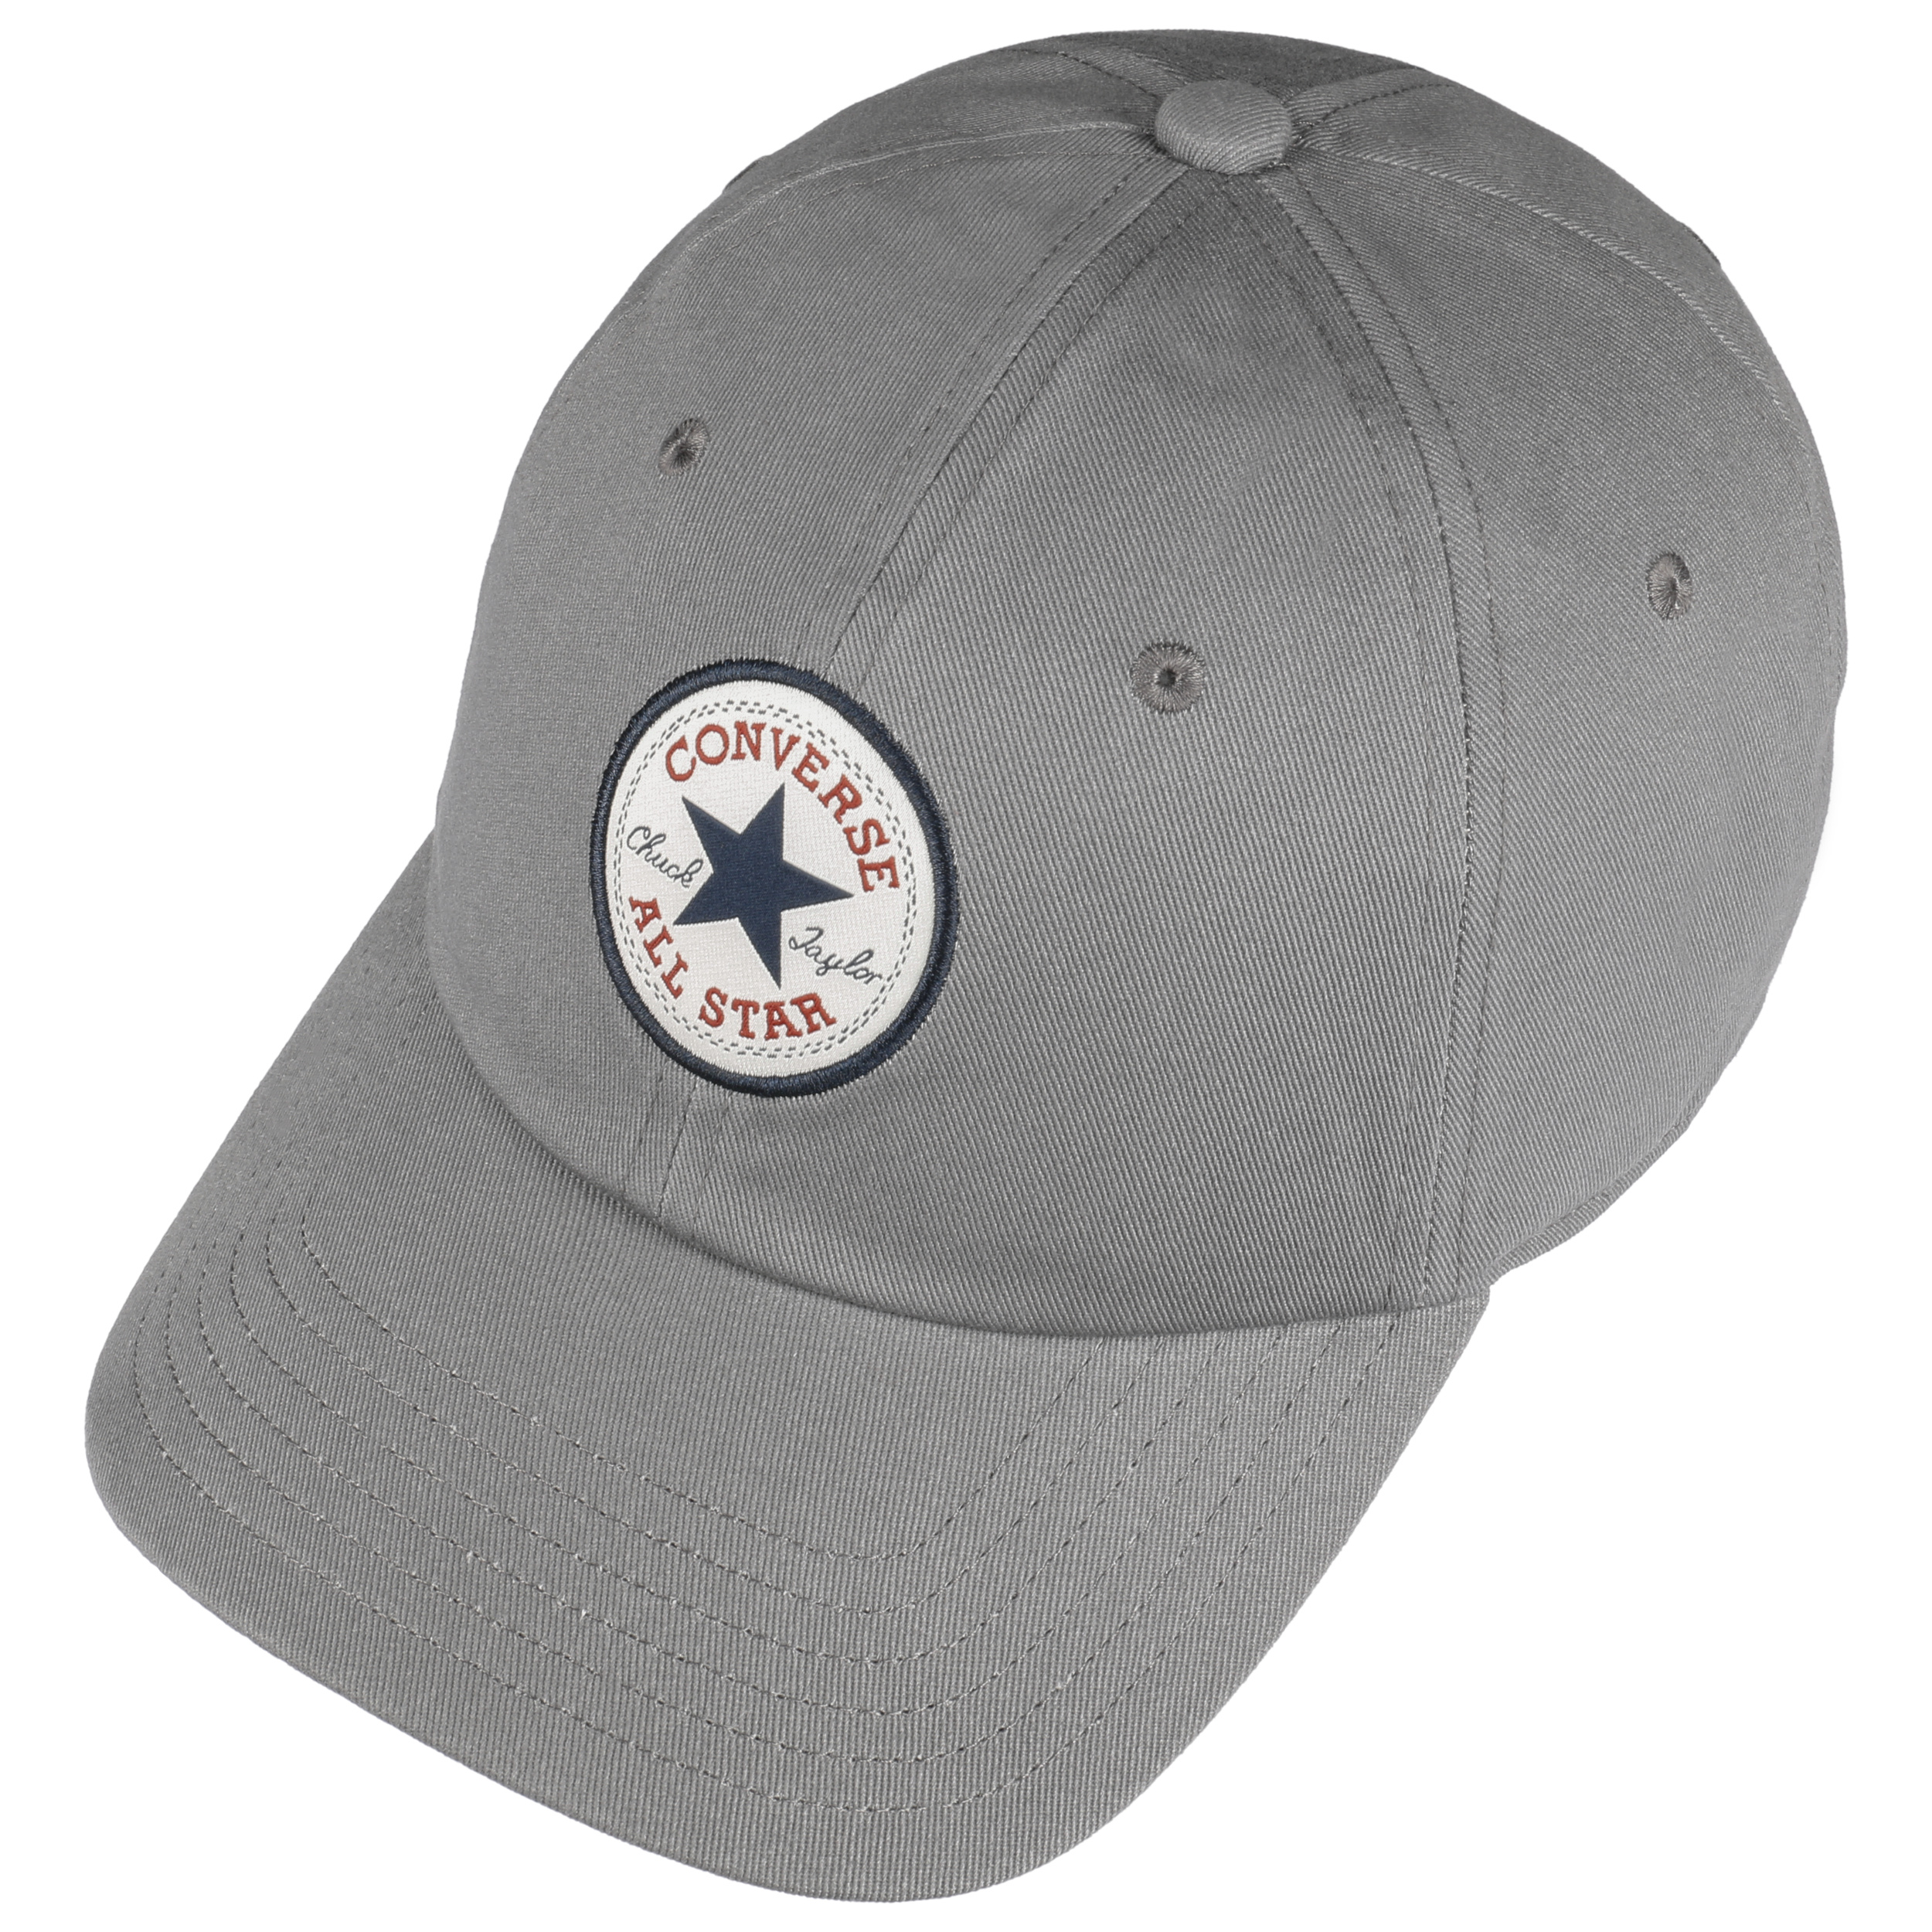 Solicitud asqueroso níquel  Core Classic Baseball Cap by Converse - 19,95 €